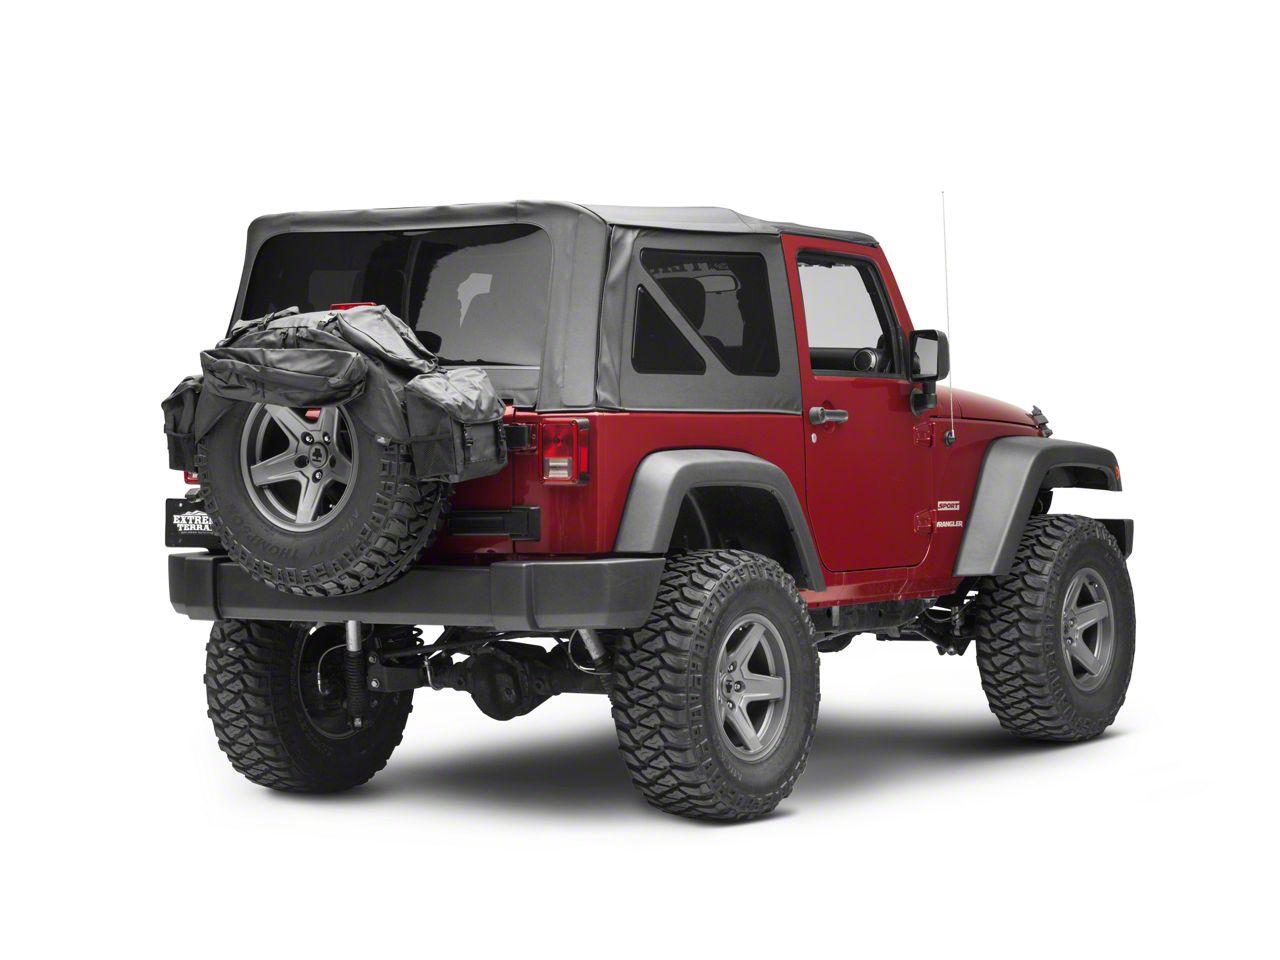 Bestop Spare Tire Organizer (87-19 Jeep Wrangler YJ, TJ, JK & JL)